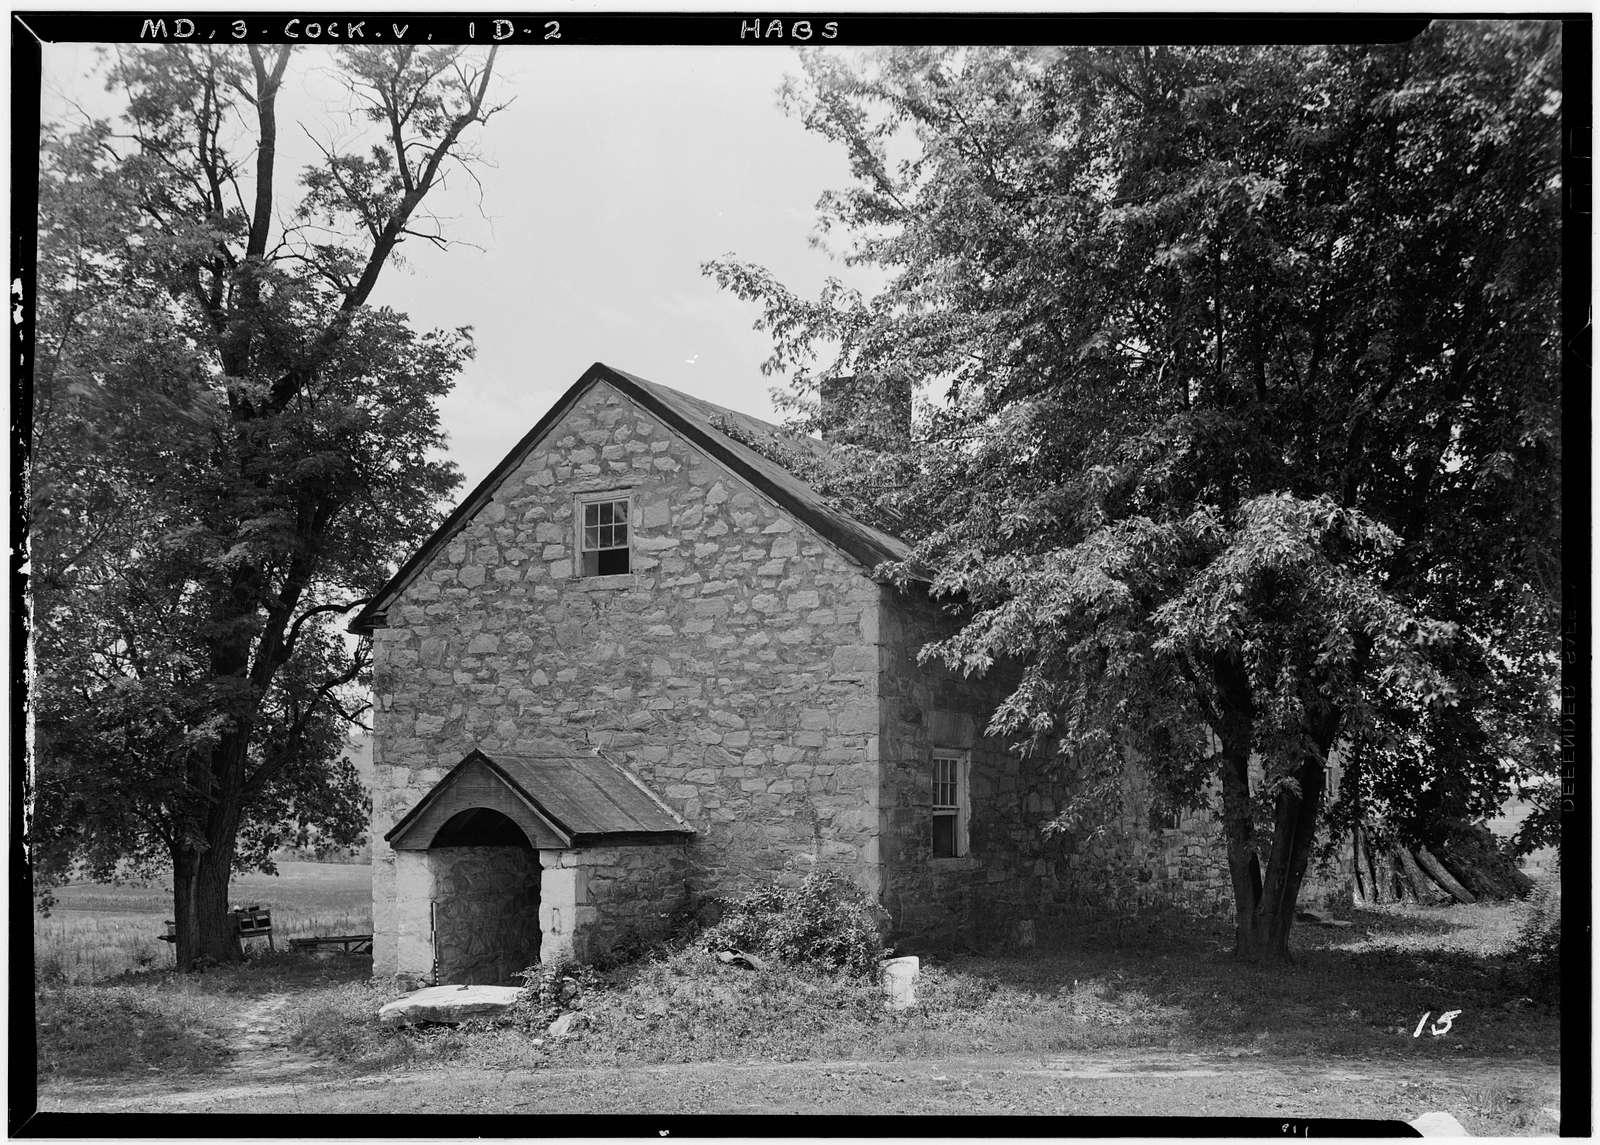 Hayfields Farm Buildings, Worthington Valley, Cockeysville, Baltimore County, MD